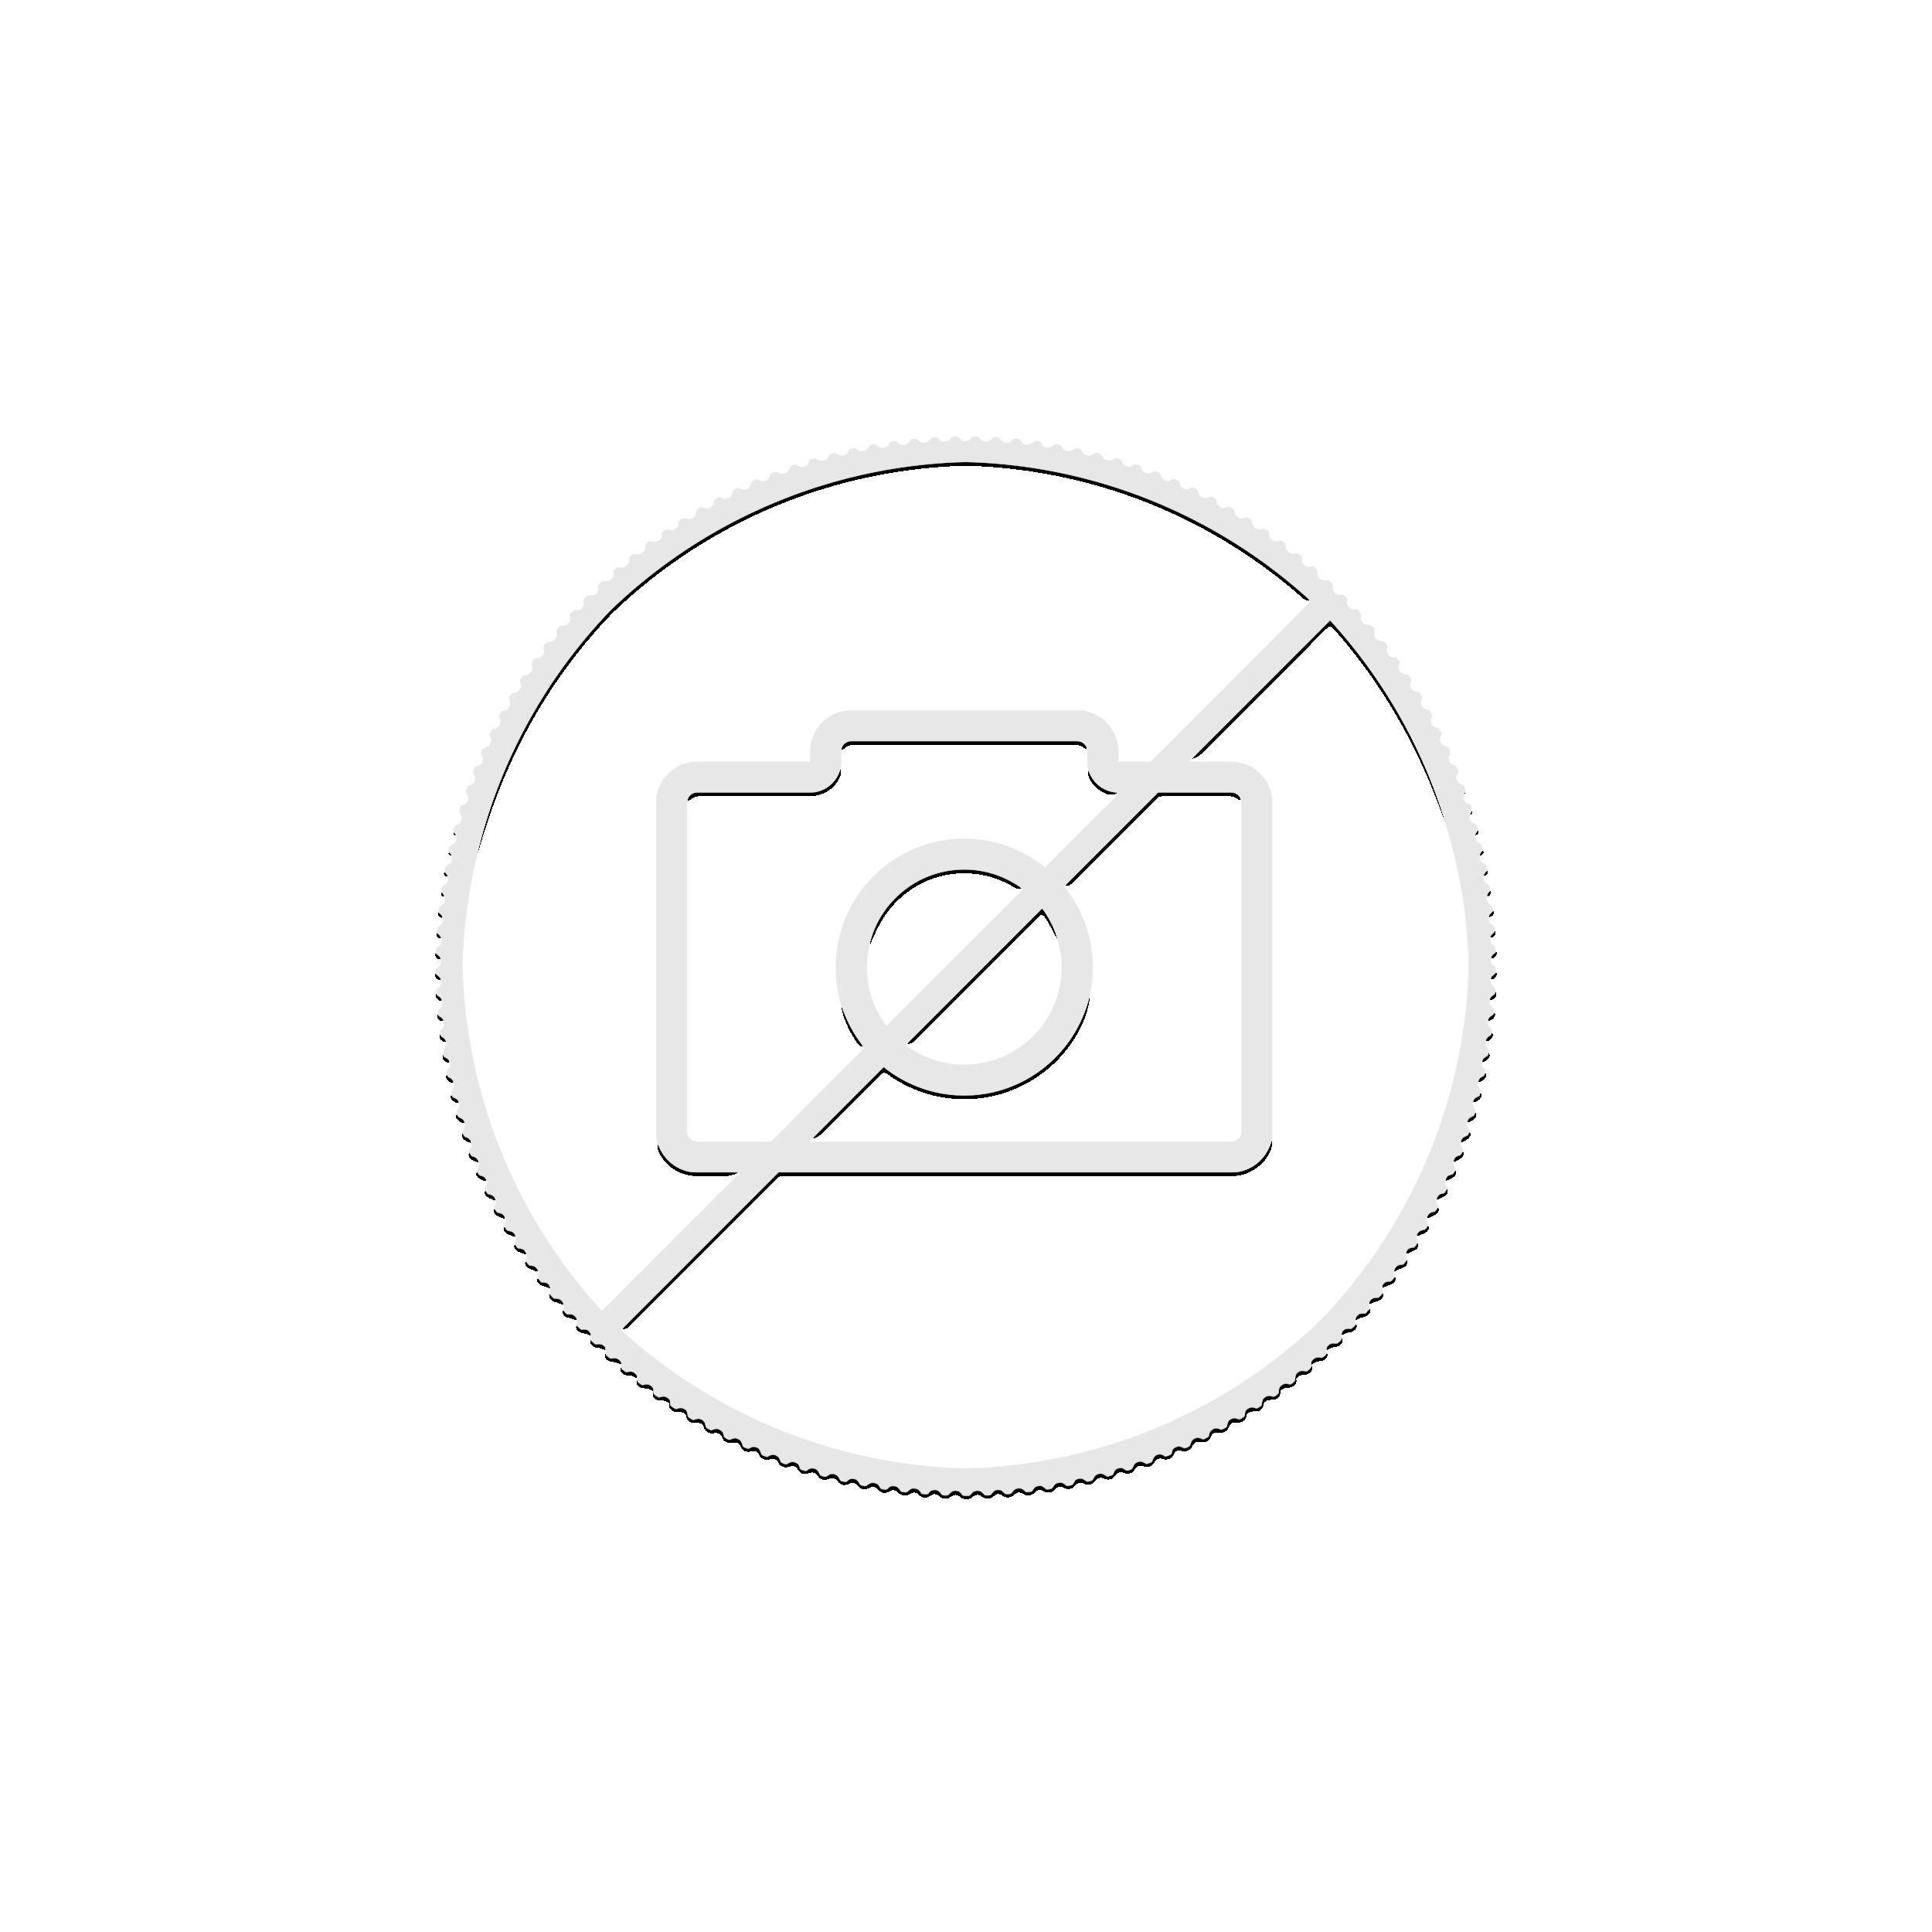 1 troy ounce gouden munt Saint-Helena engel 2021 Proof